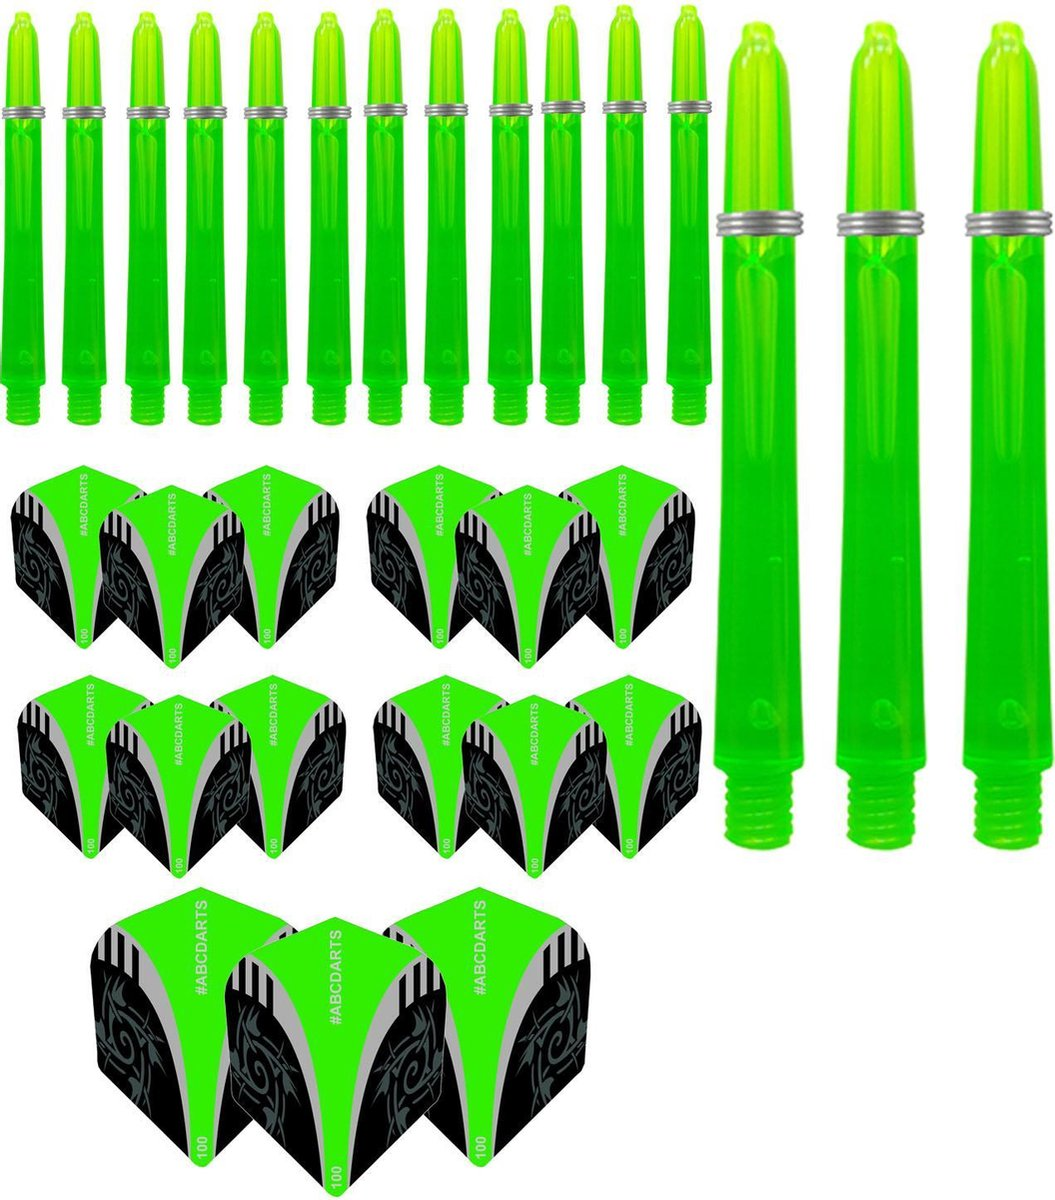 ABCDarts Tribal Dart Flights - Edgeglow Dart Shafts Medium - Groen - 5 sets